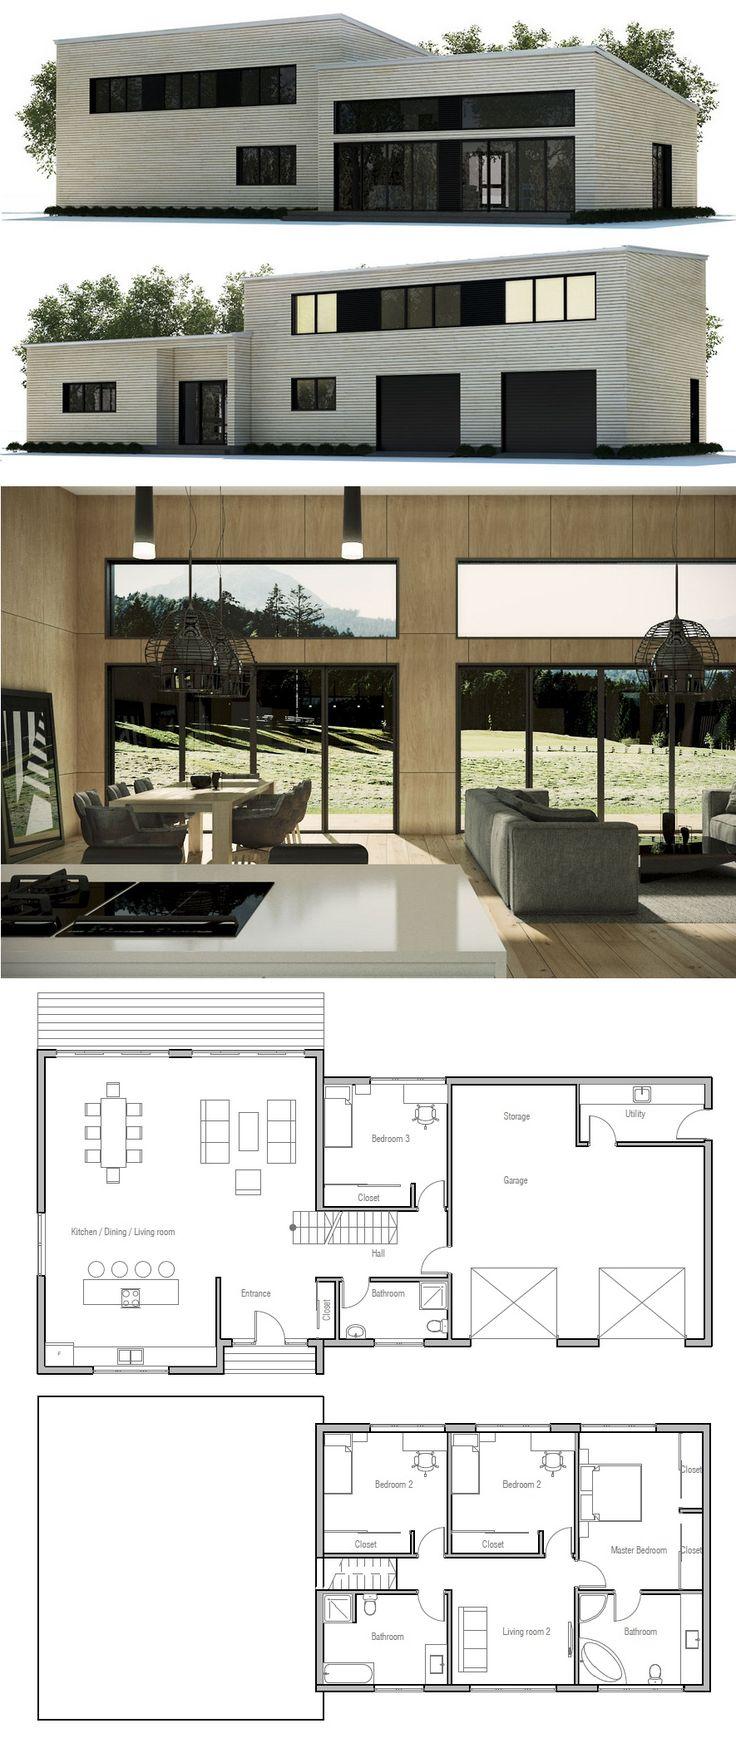 best images about idee per la casa on pinterest coins house